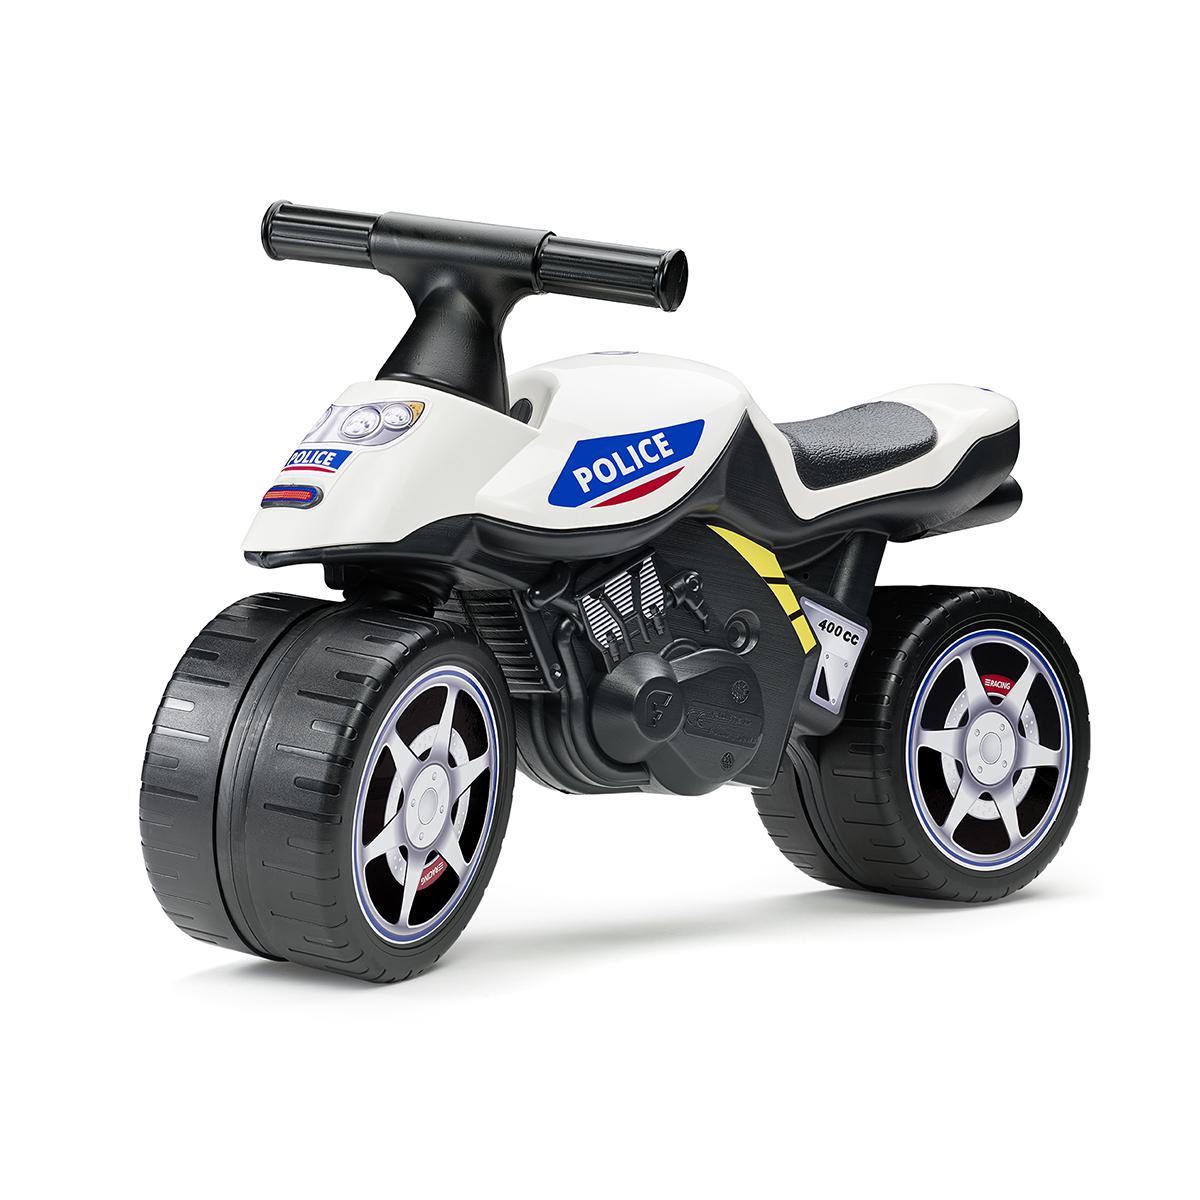 Porteur Falk Baby Moto Police - Blanc et Bleu